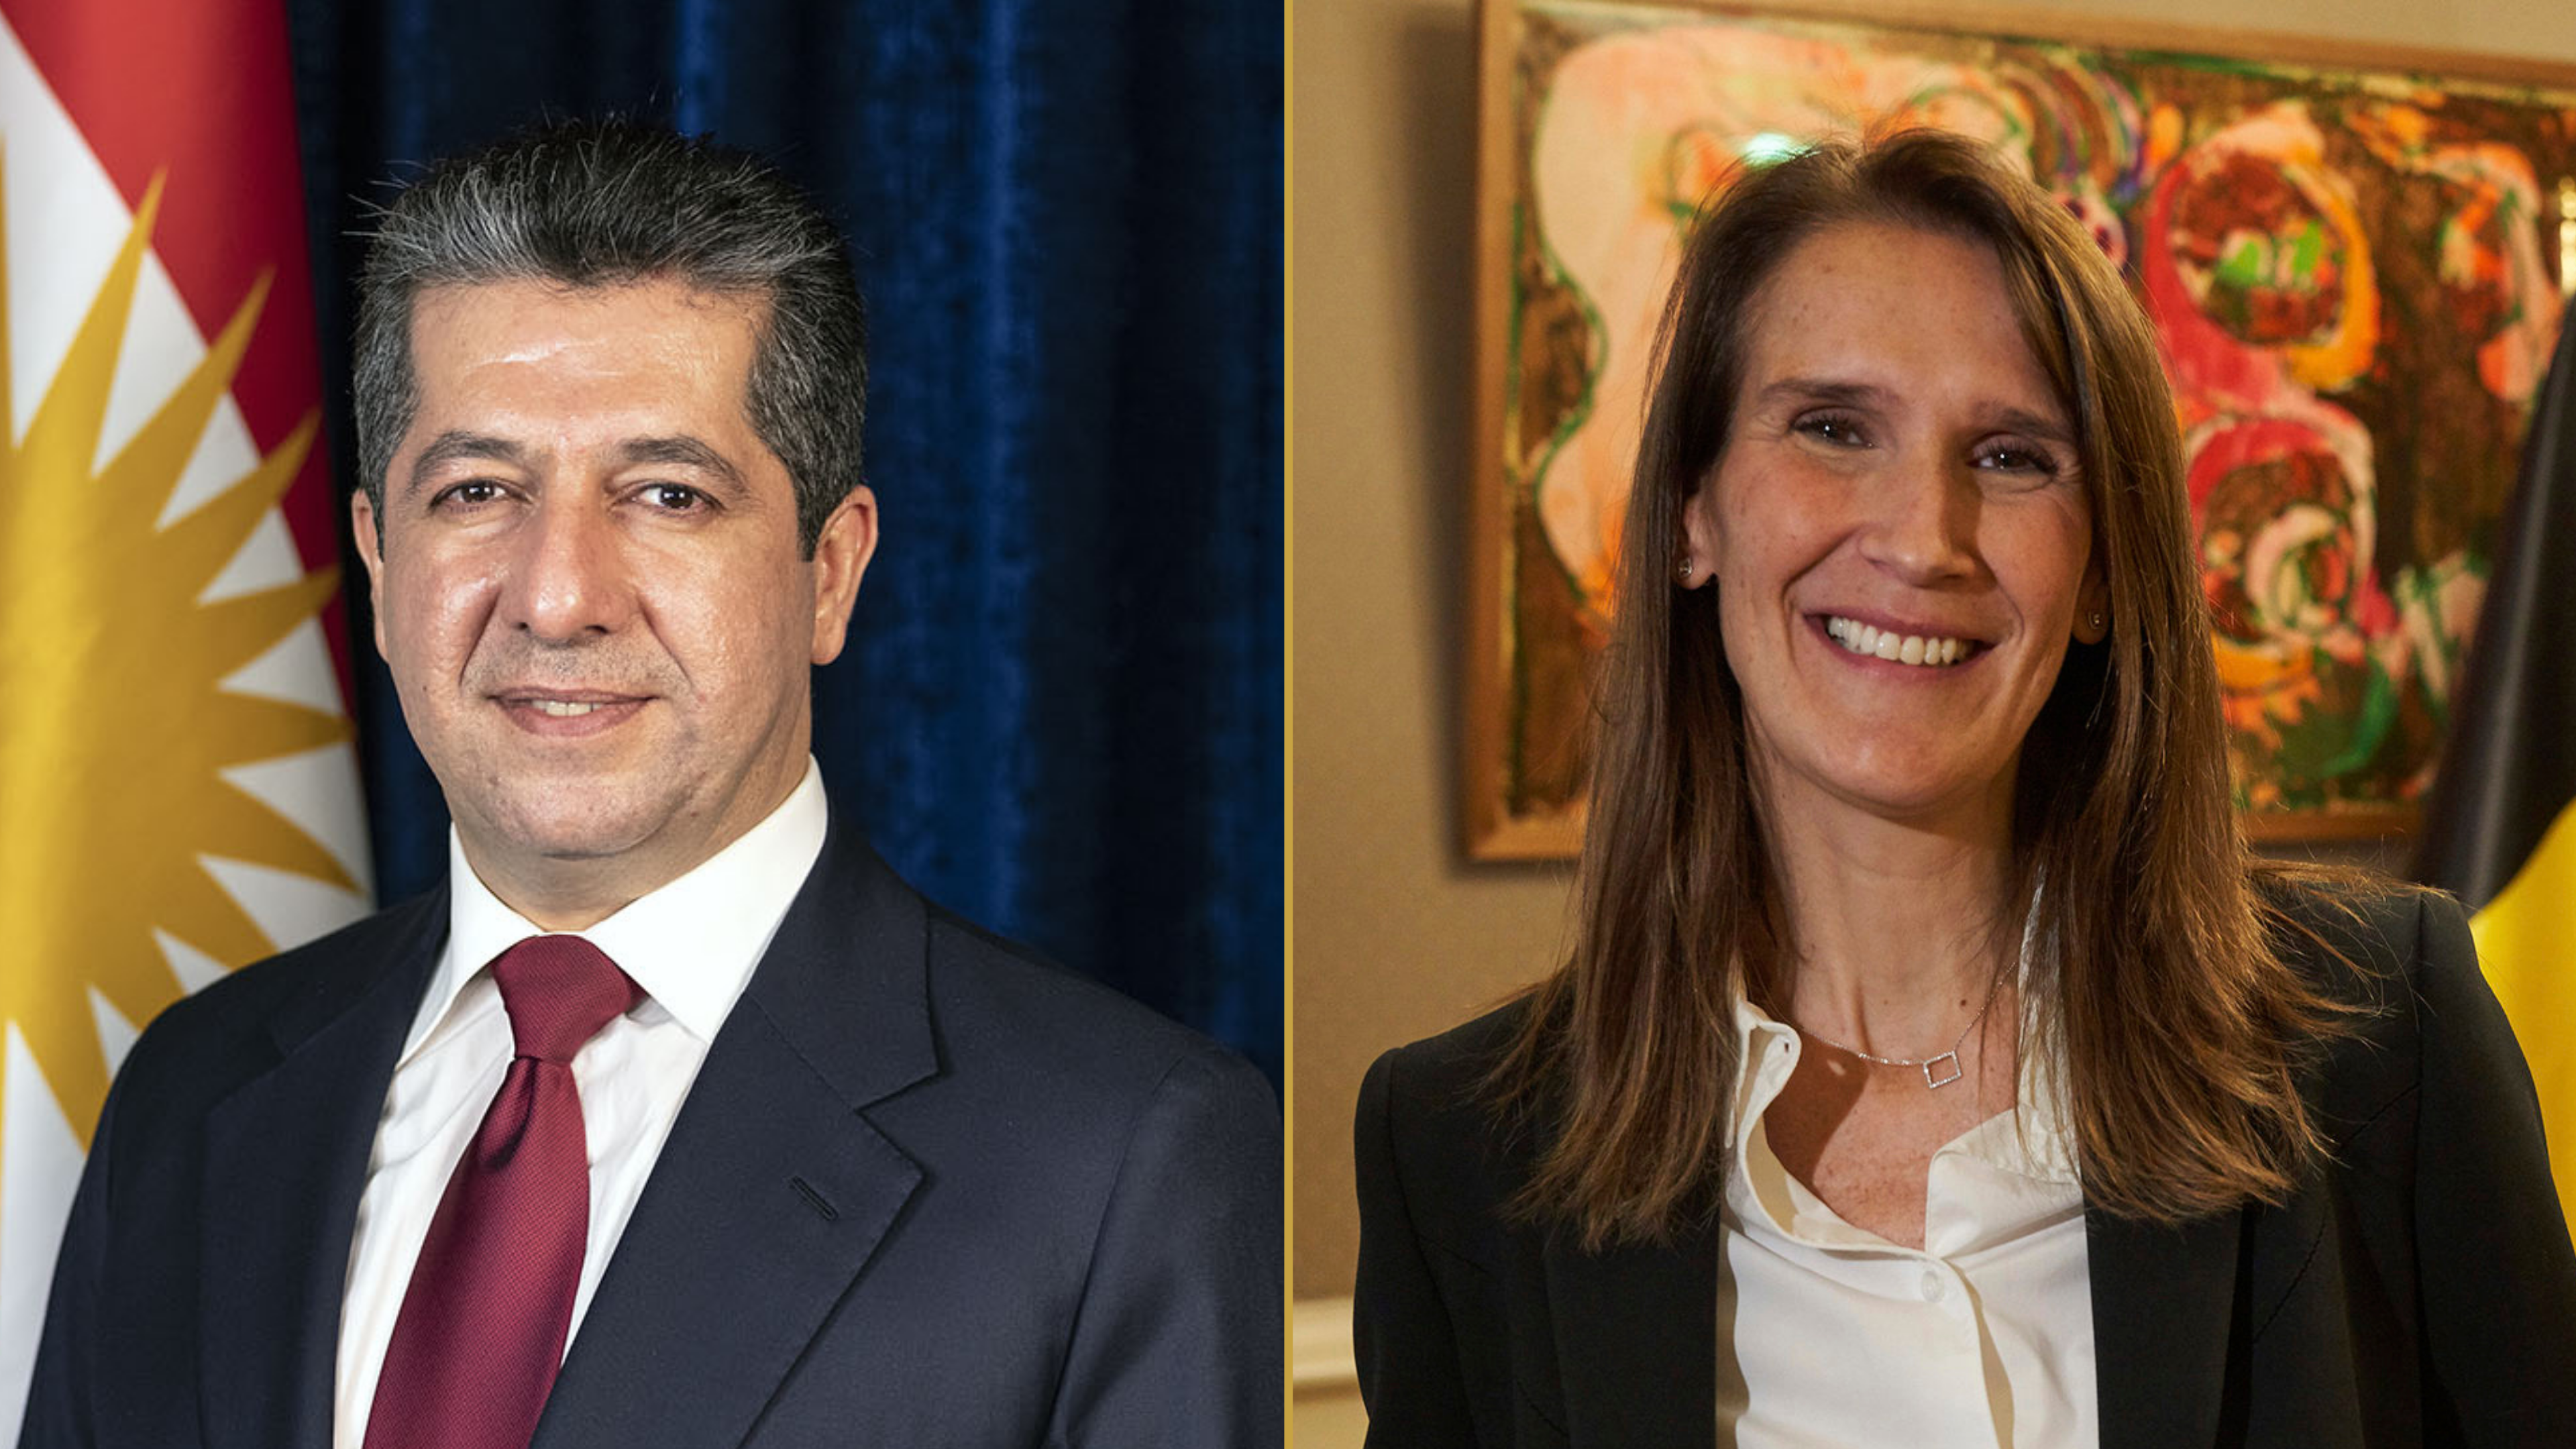 PM Masrour Barzani's call with Belgium Deputy PM